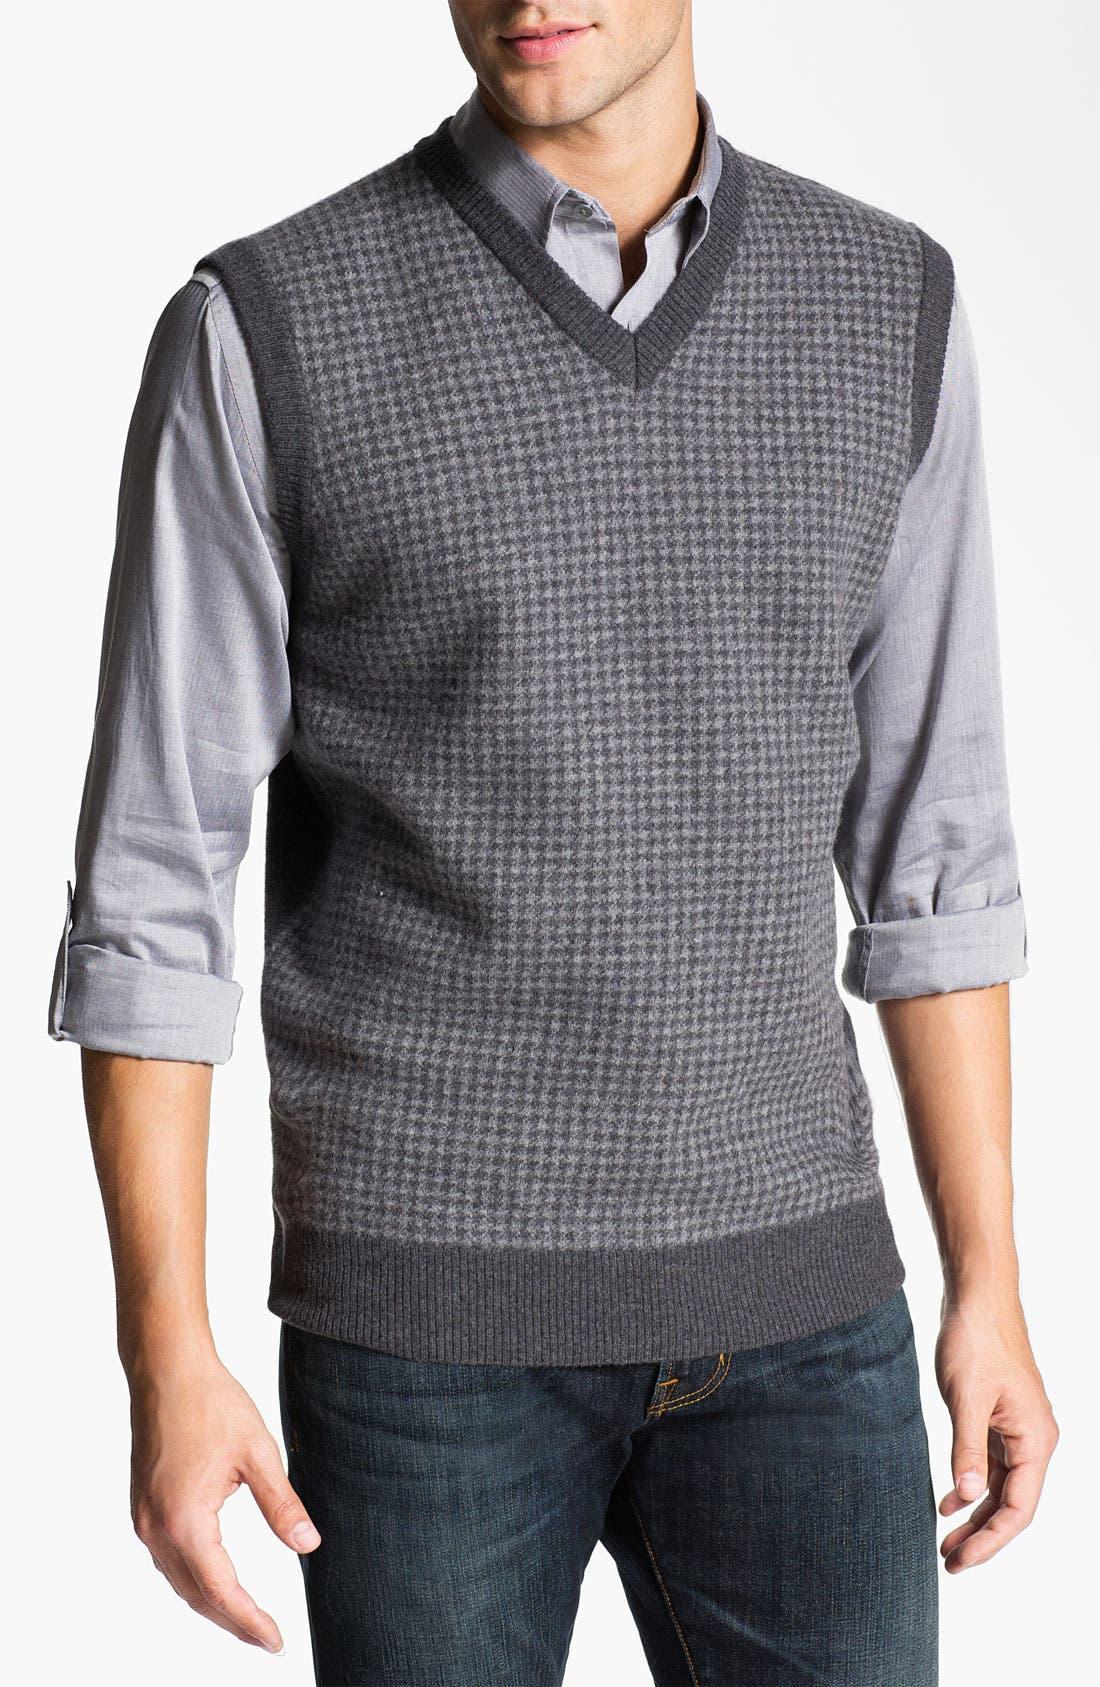 Main Image - Franco Danti V-Neck Wool Sweater Vest